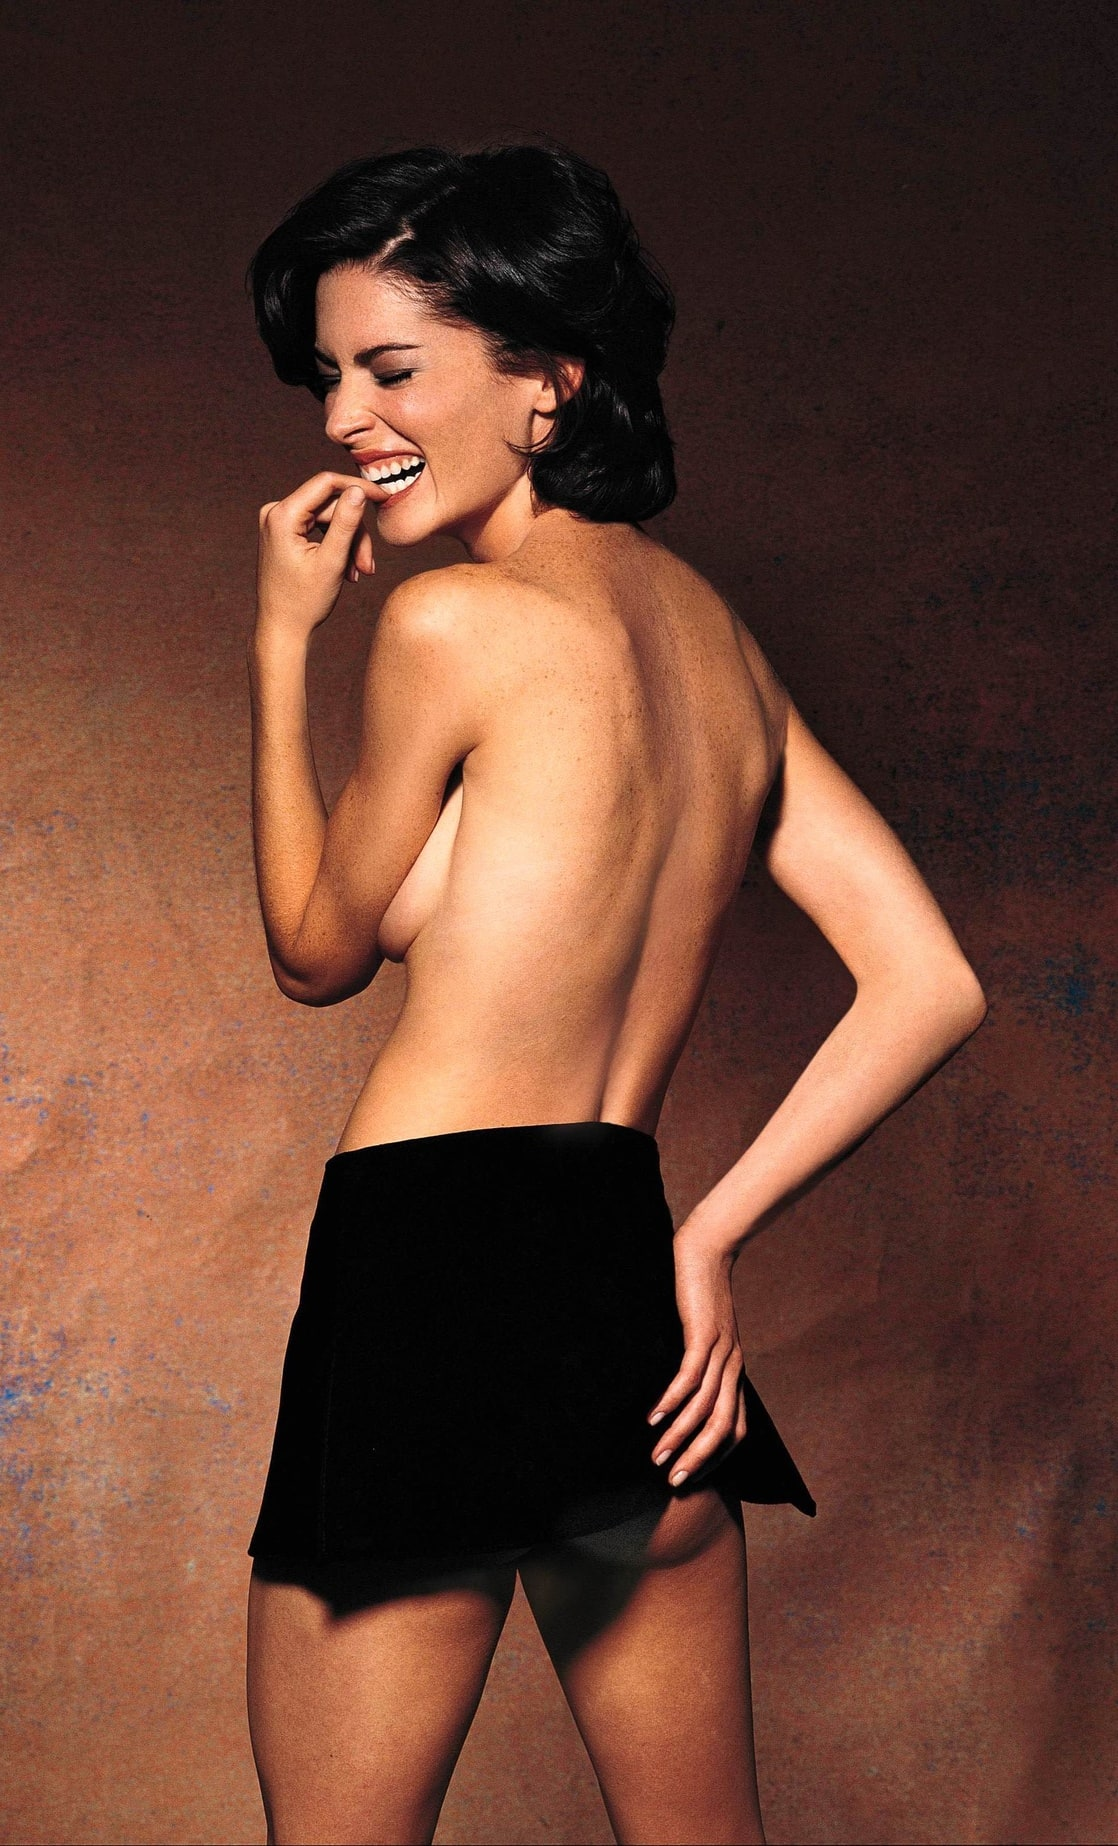 Lara Flynn Boyle Nudes